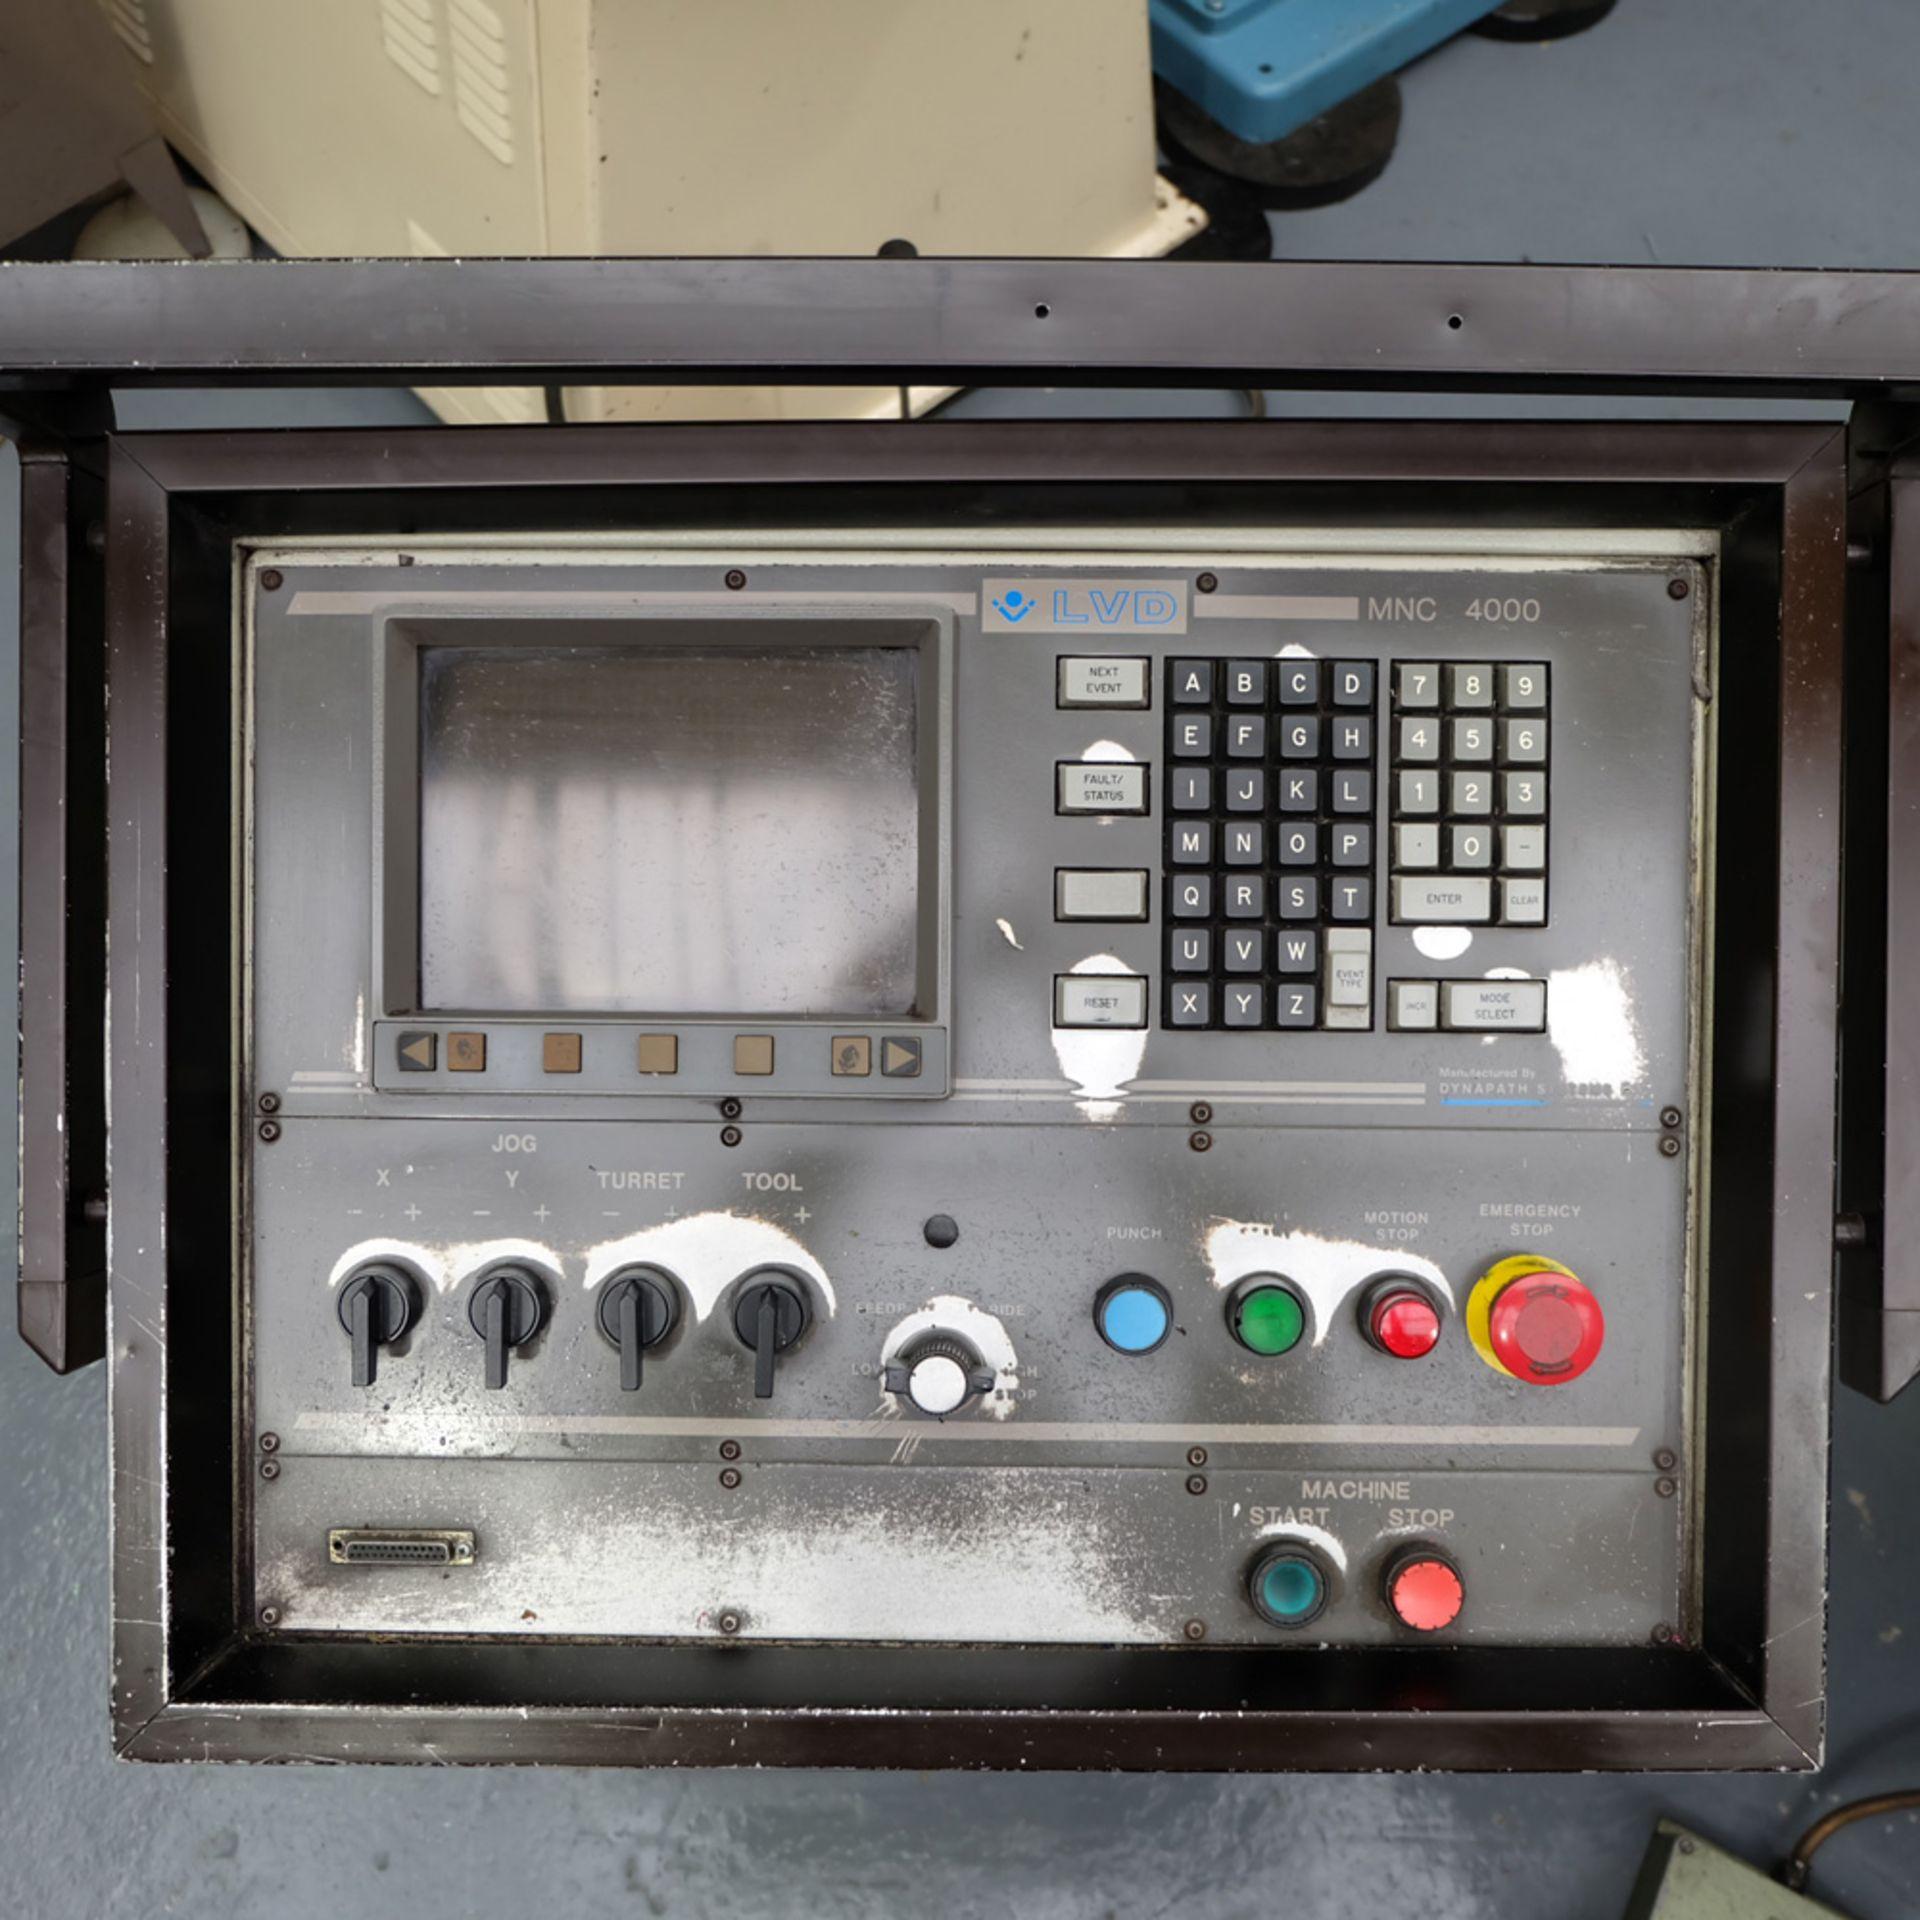 LVD Shape Delta 1000 Thick CNC Turret Punching Machine. - Image 8 of 18